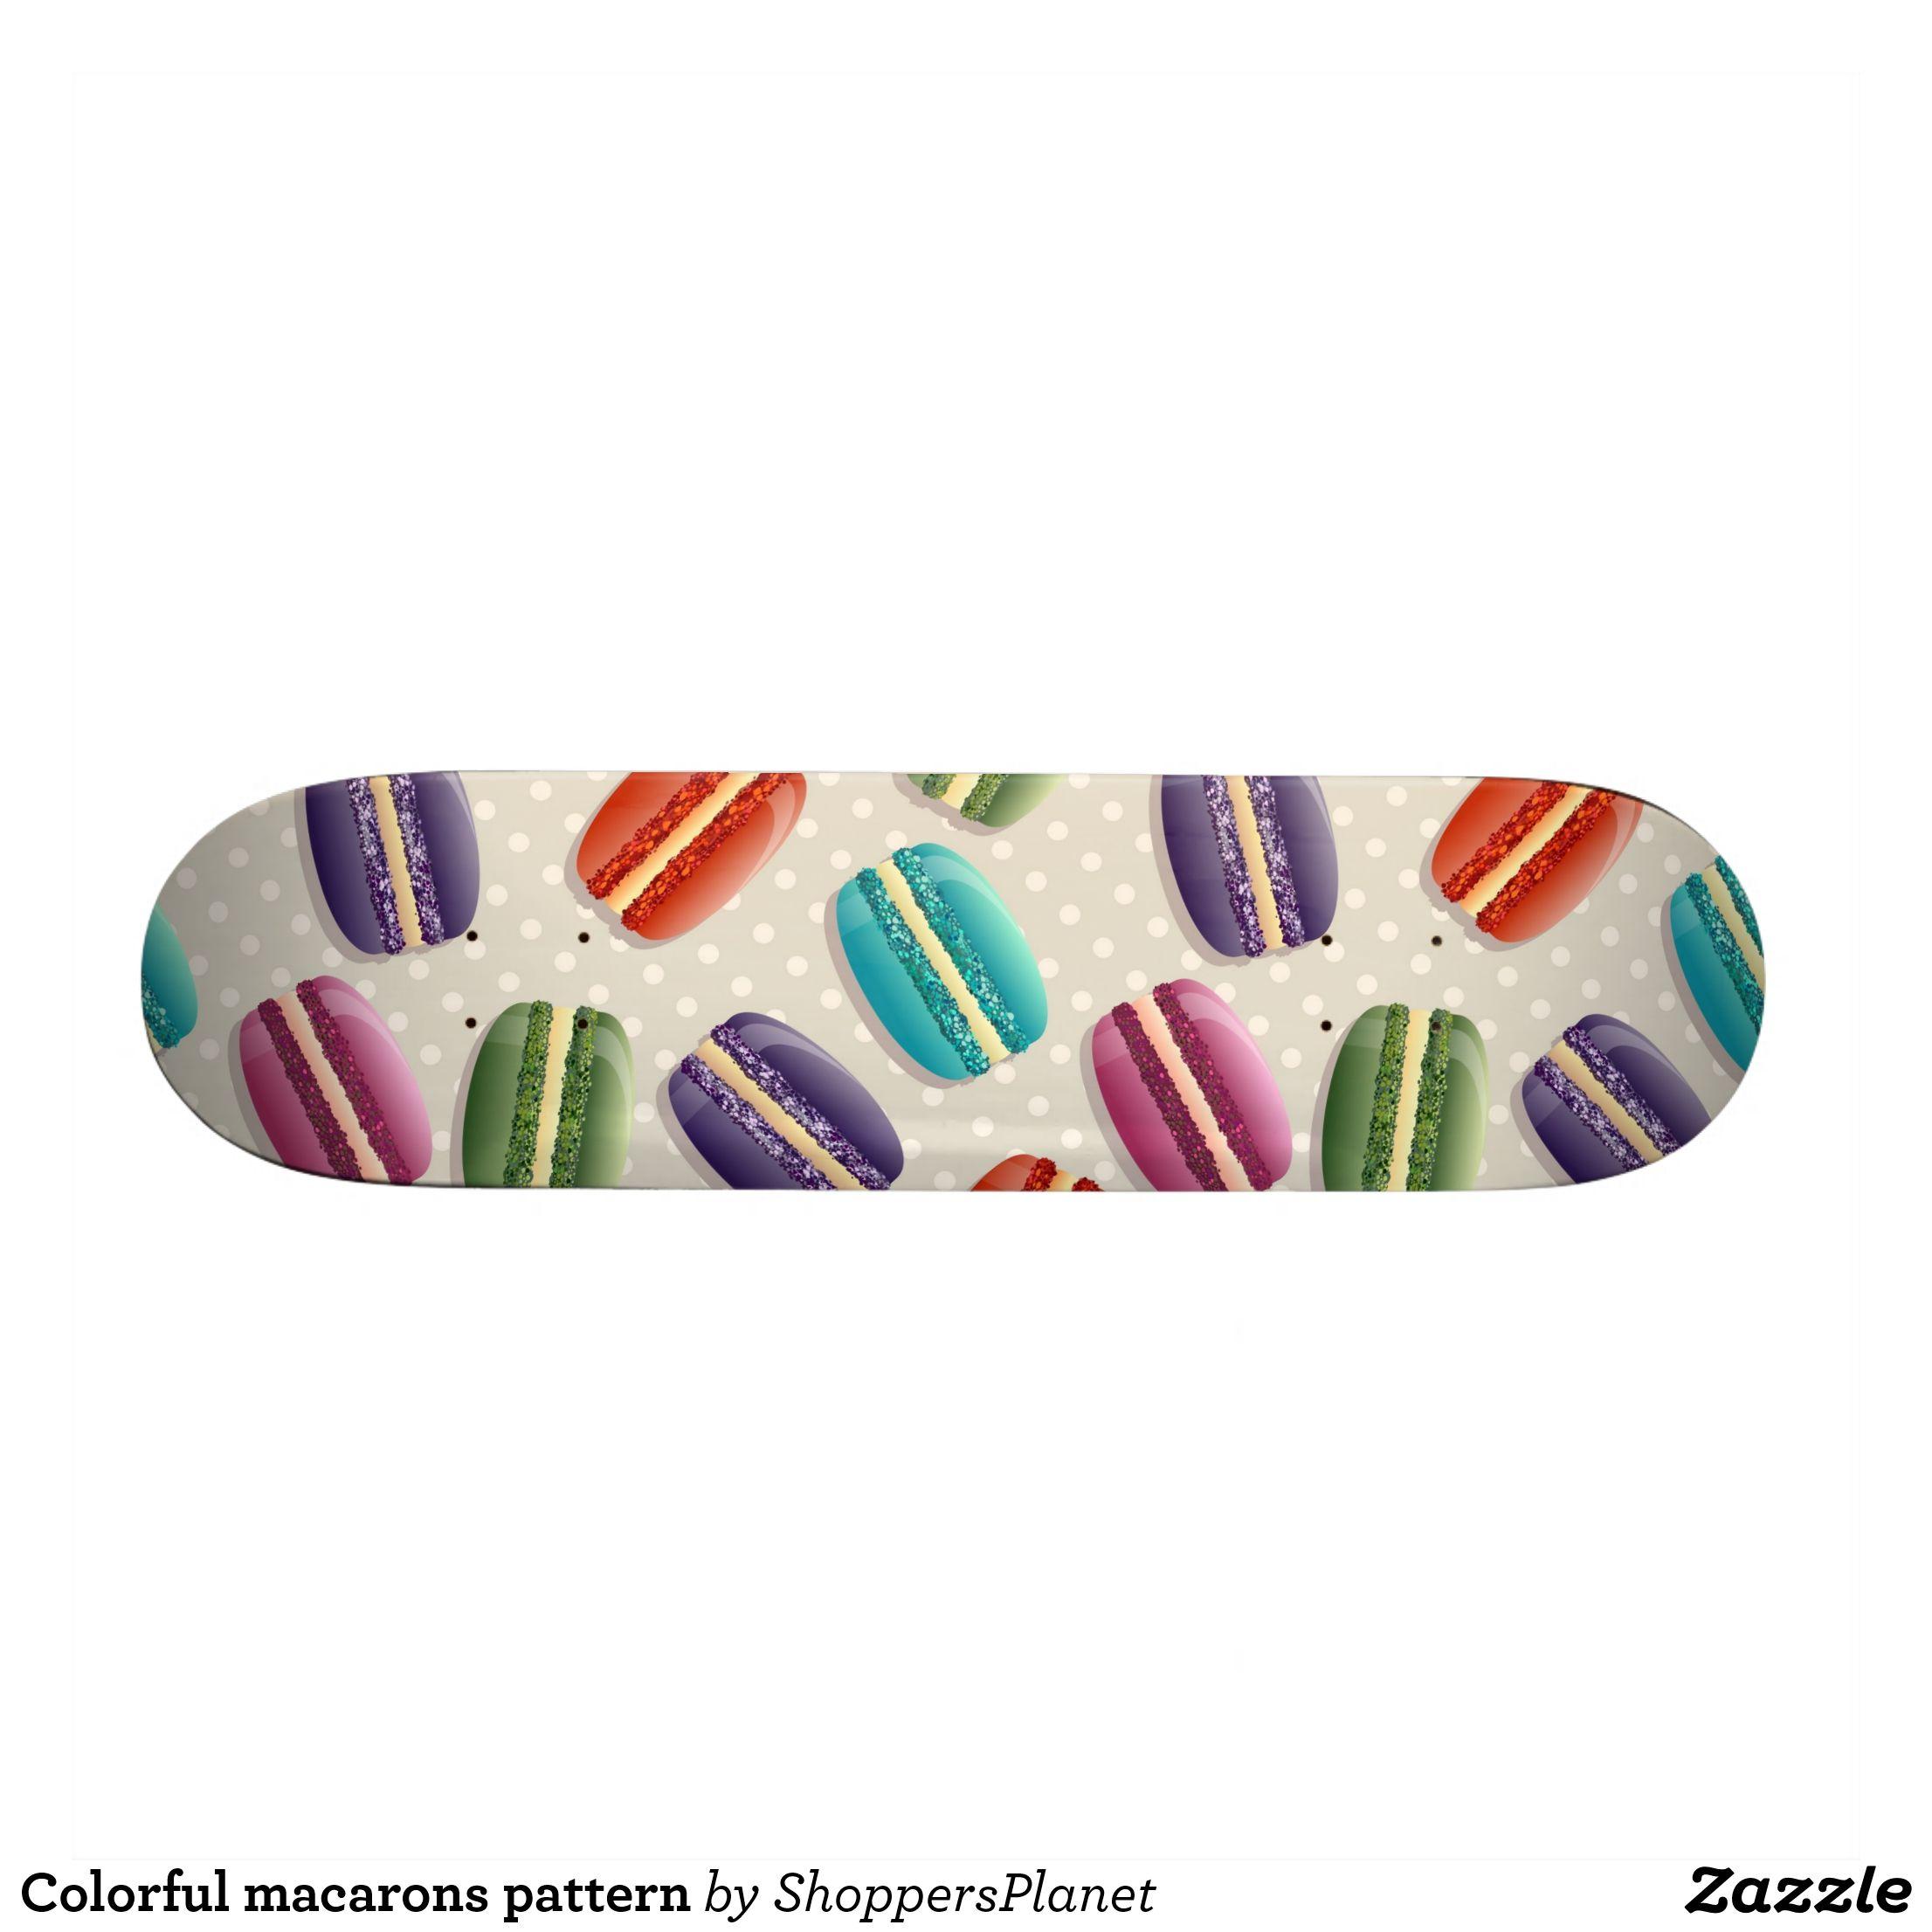 Colorful macarons pattern skateboard - Supreme Hard-Rock Maple Deck Custom Boards By Talented Fashion & Graphic Designers - #skating #skater #skateboarding #shopping #bargain #sale #stylish #cool #graphicdesign #trendy #design #designer #graphicdesigner #style